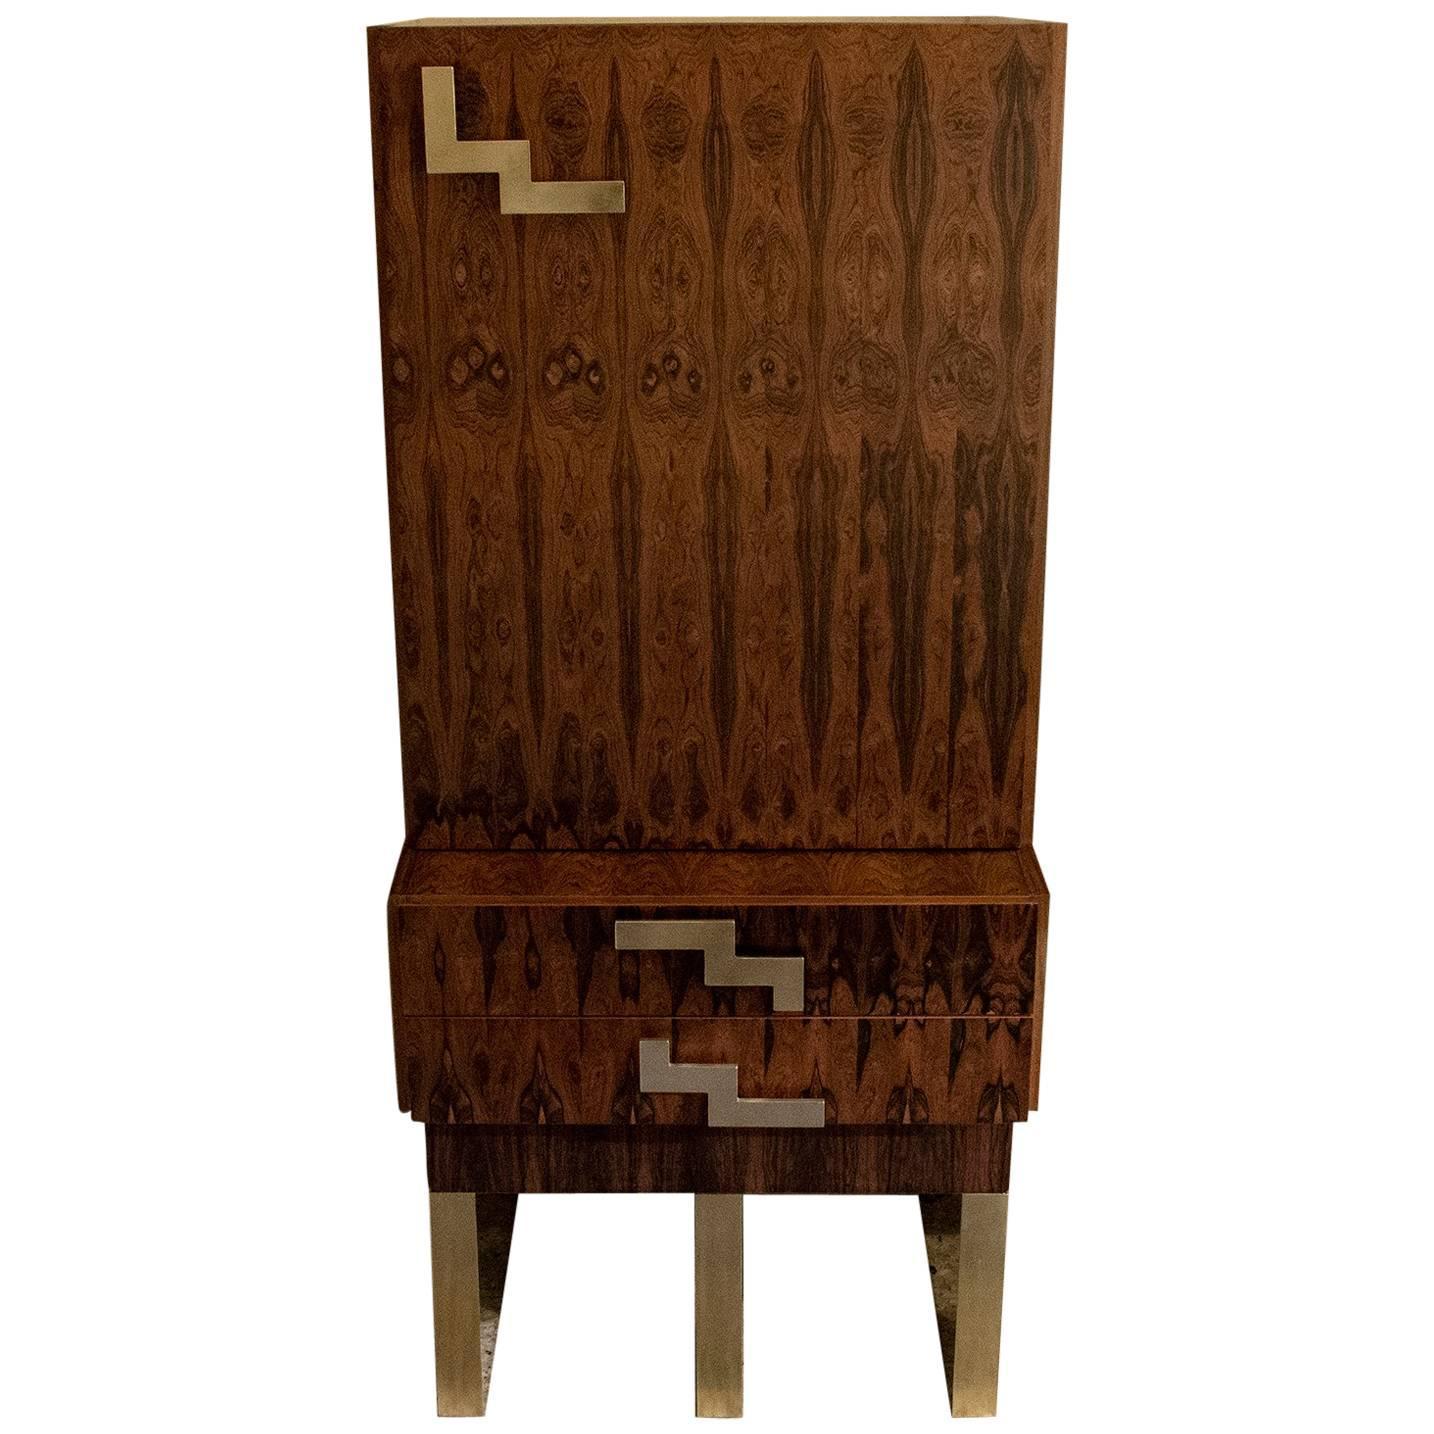 Genial Tall Cabinet/Dry Bar Palisander, France, 1960s